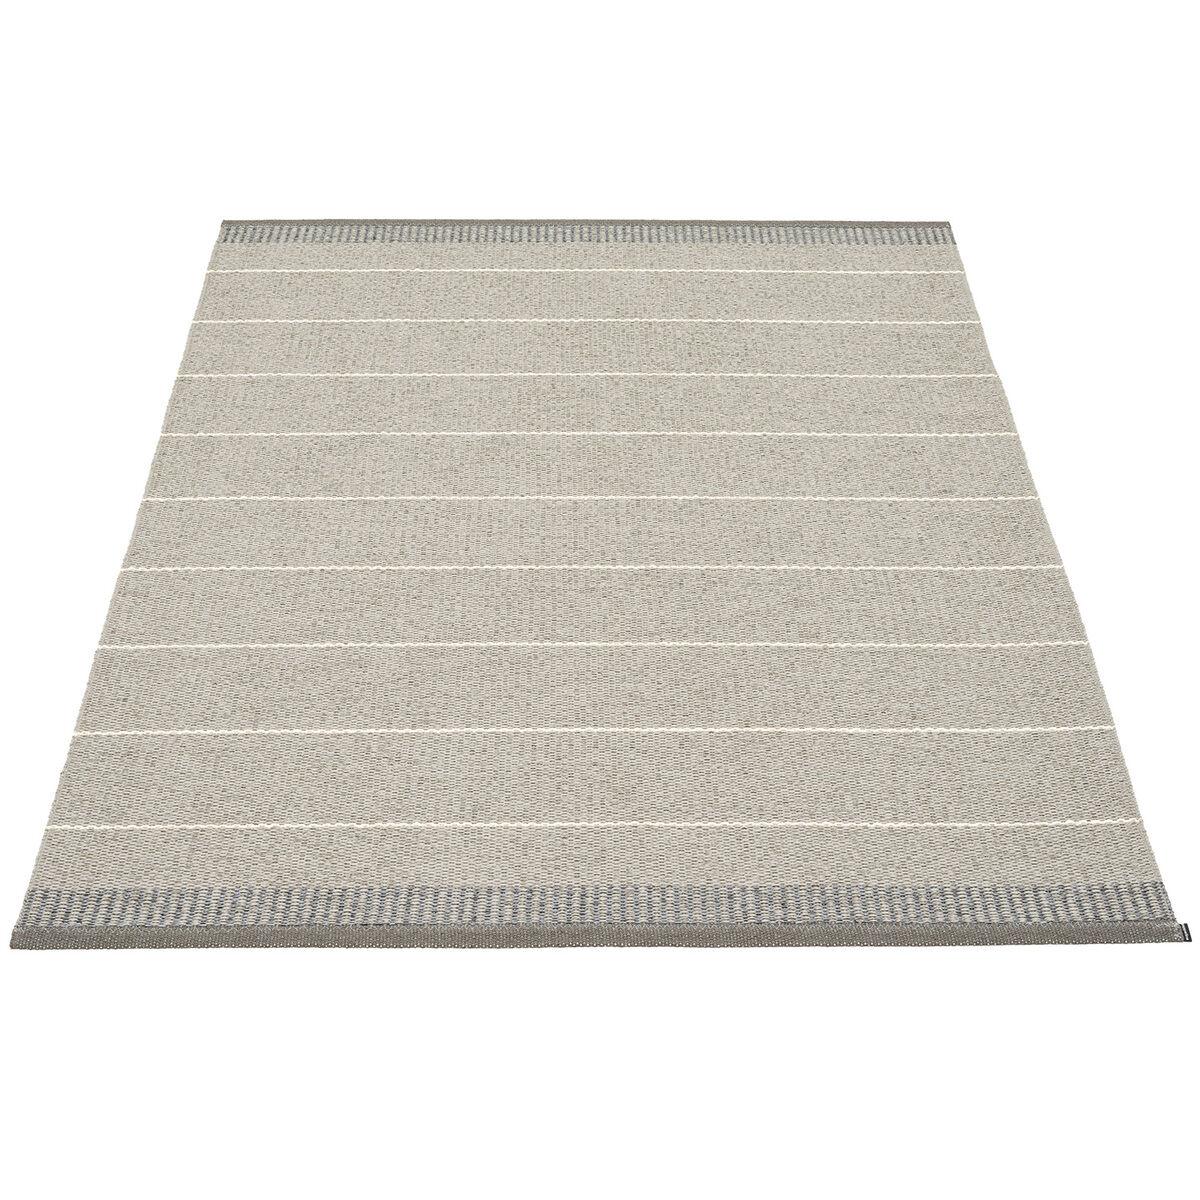 Image of Pappelina Belle matto 140 x 200 cm, concrete